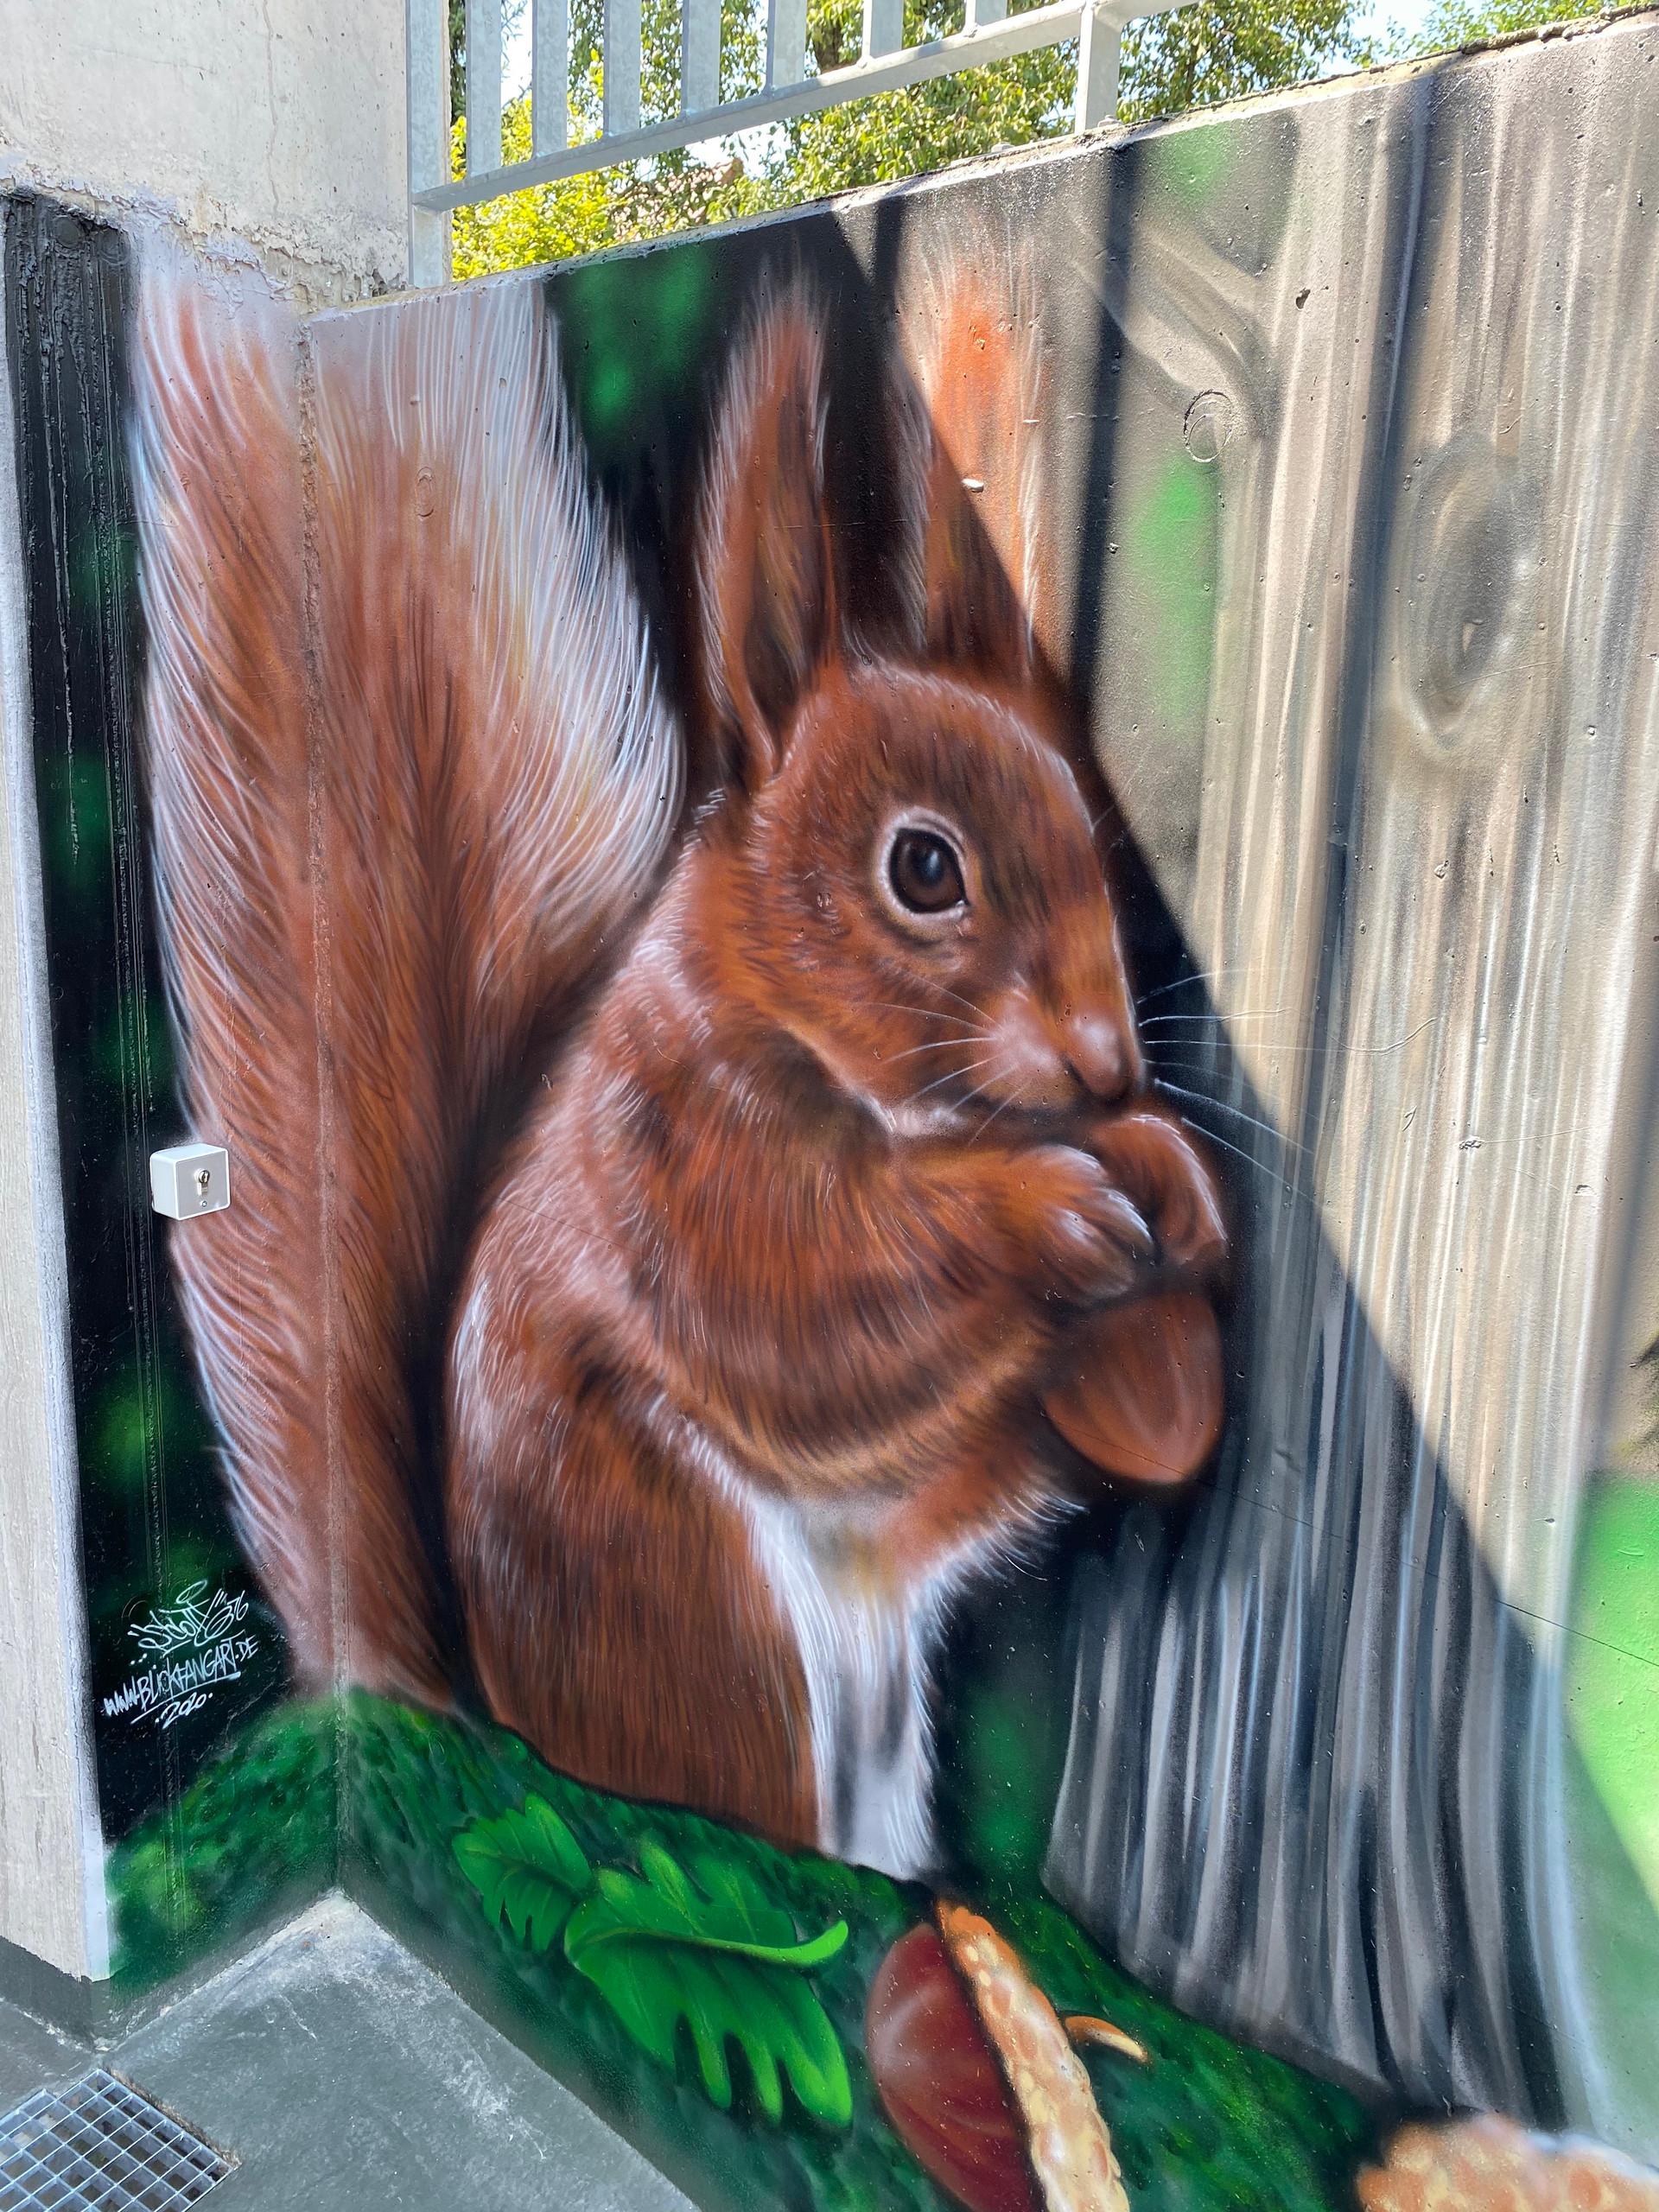 Eichhörnchen Graffiti Airbrush